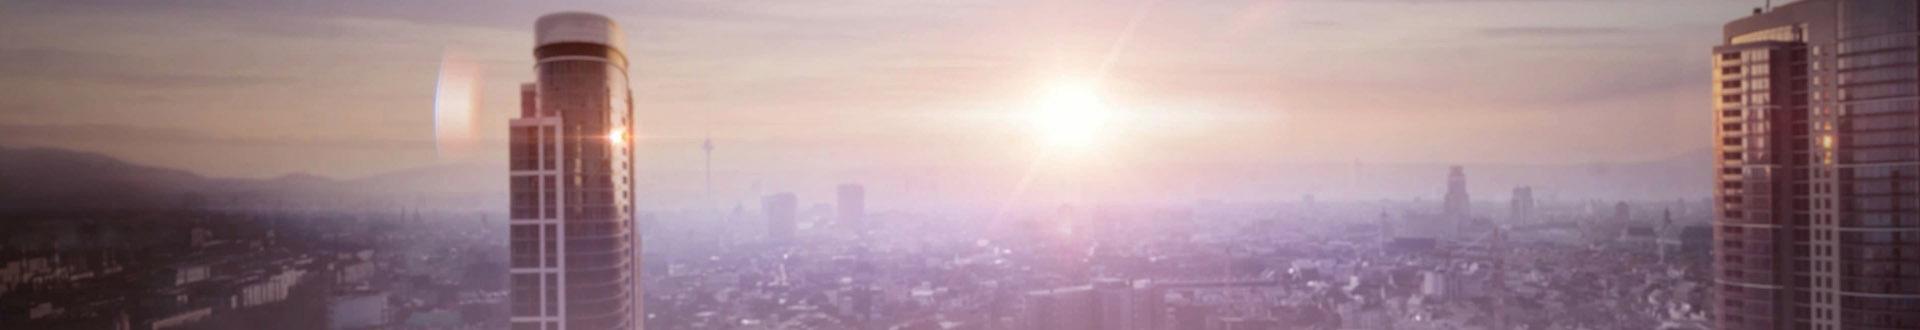 testimonial-video-frankfurt-skyline_banner